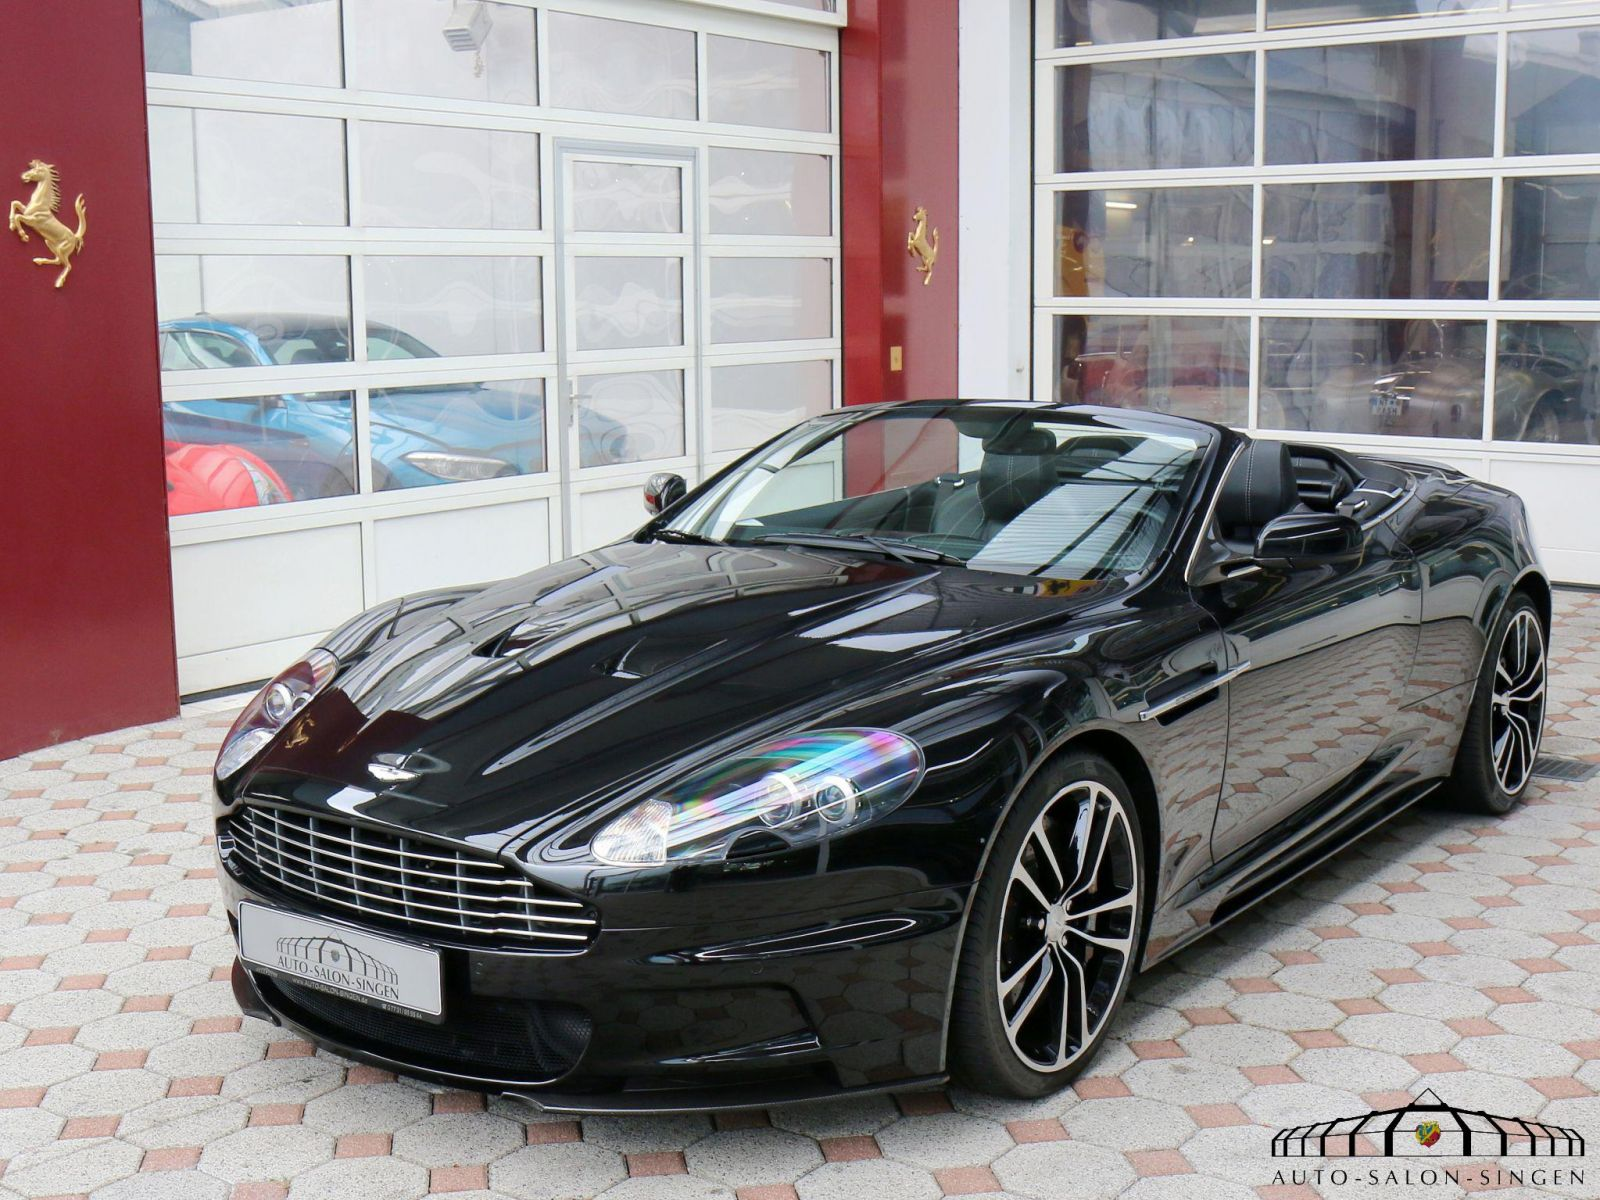 Aston Martin Dbs Volante Cabrio Auto Salon Singen